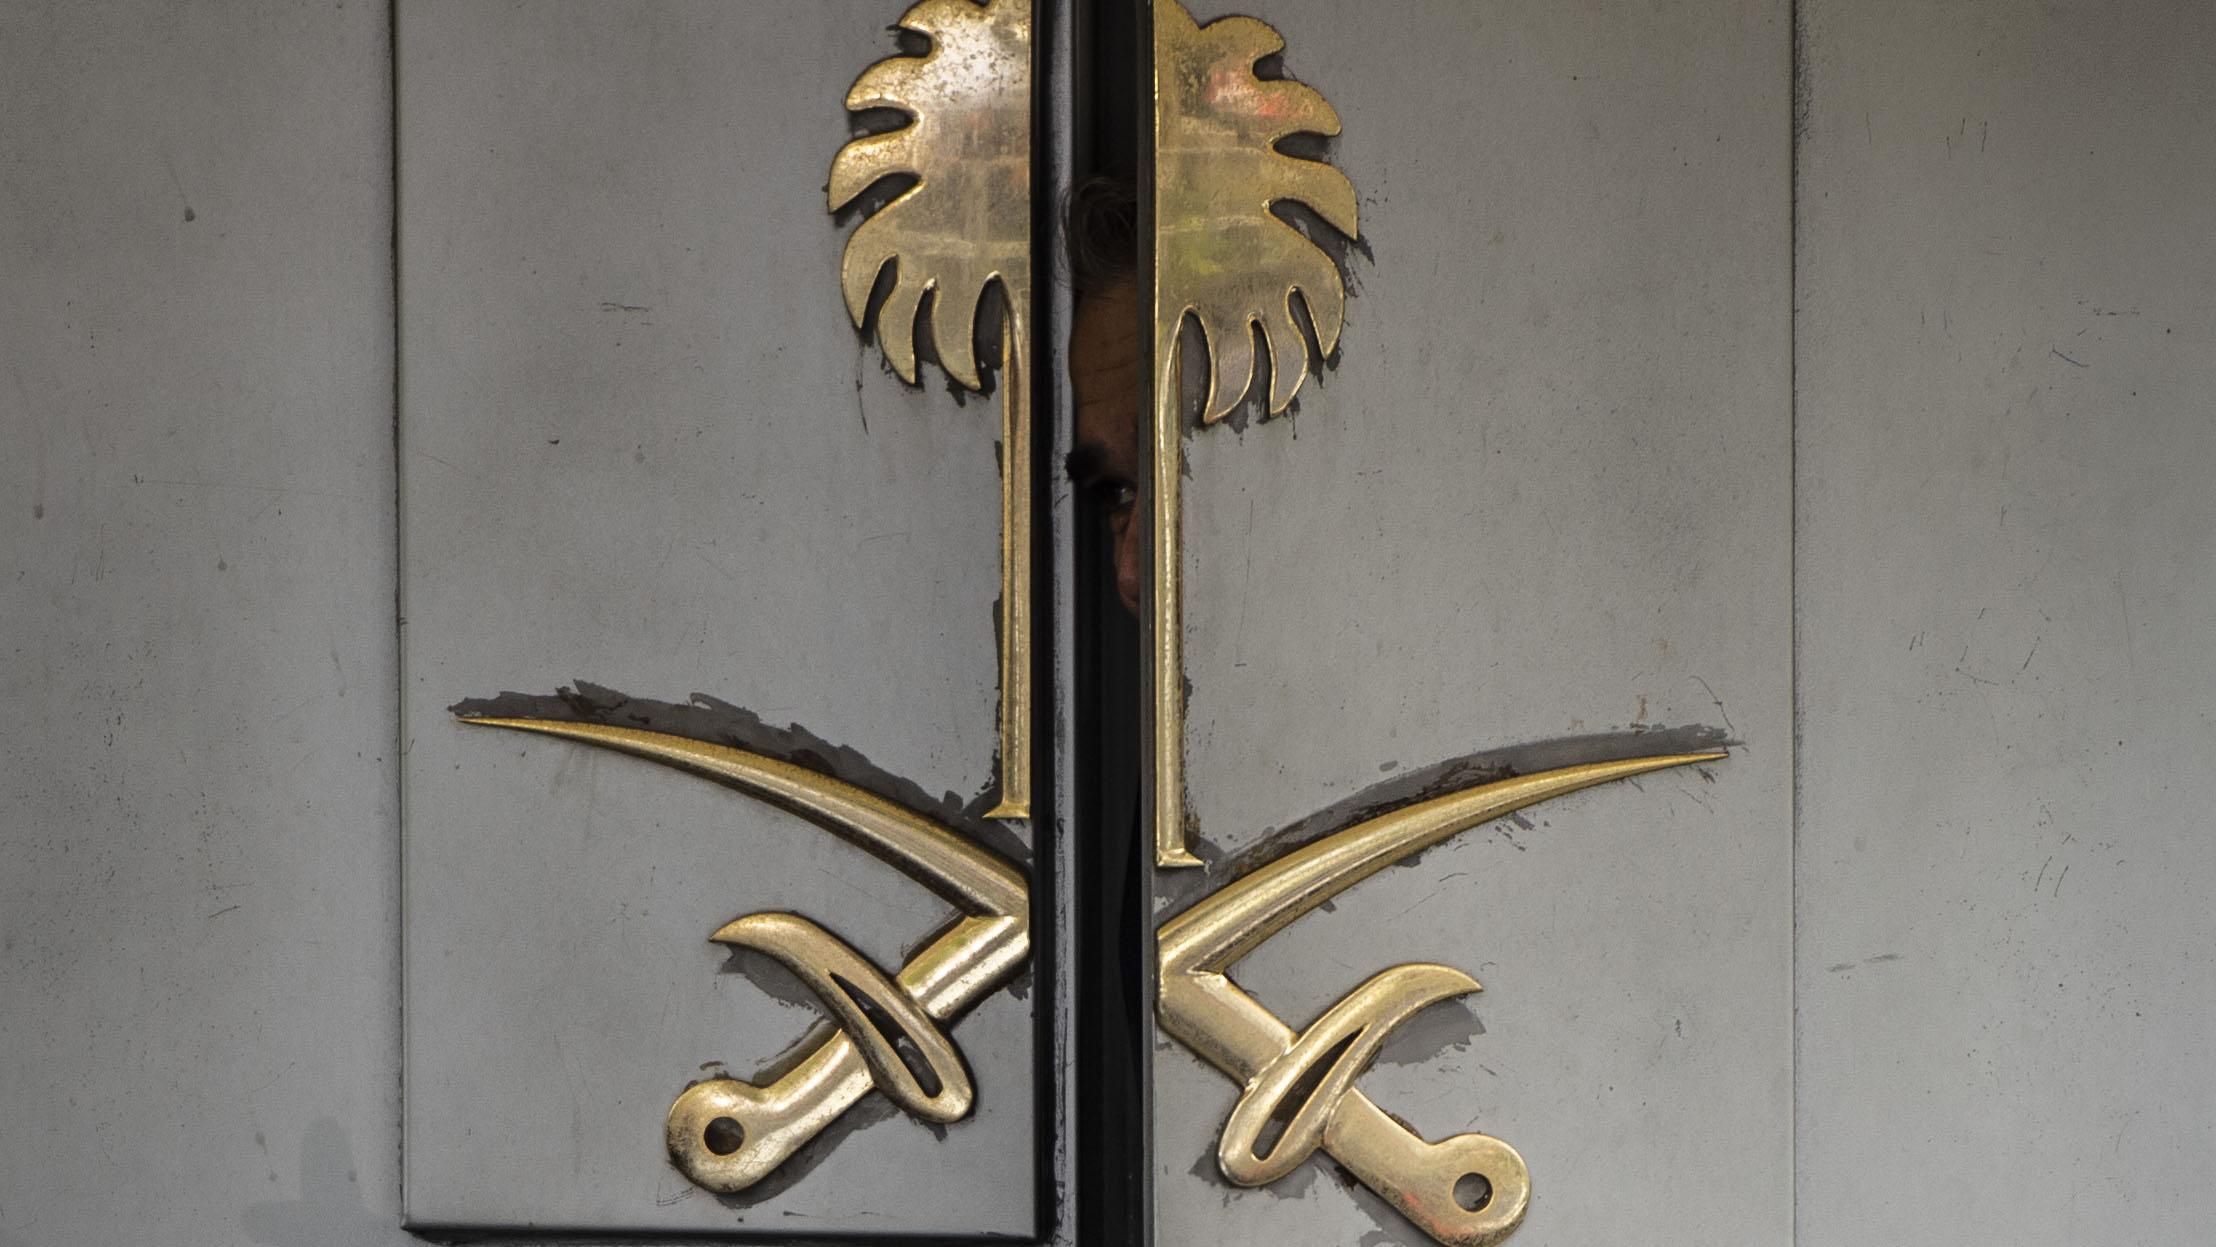 McKinsey `Horrified' Saudi Arabia Memo May Have Been Misused - Bloomberg